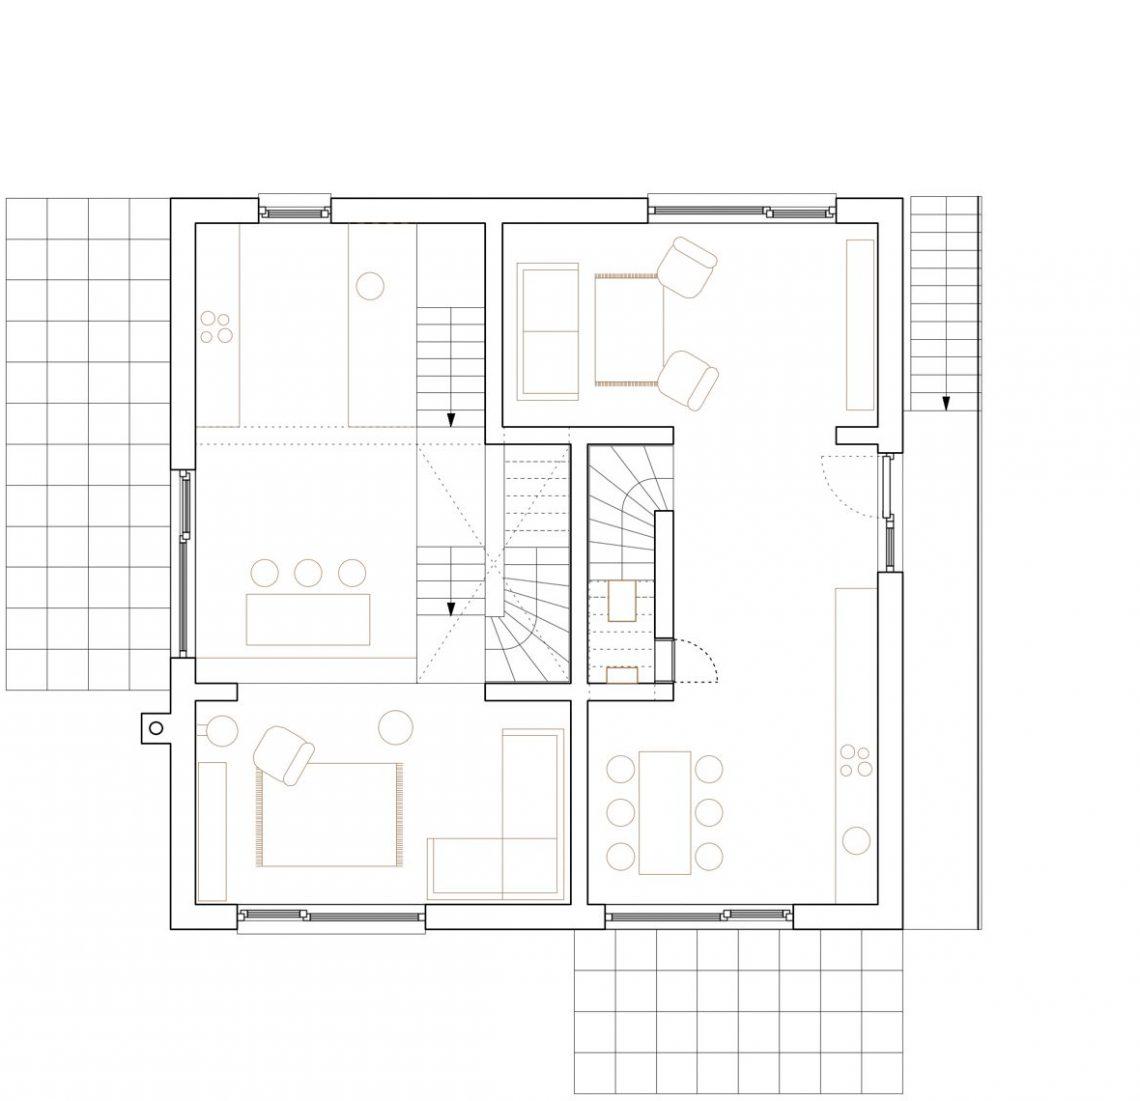 doppelhaus bonn wolfgang zeh architekt. Black Bedroom Furniture Sets. Home Design Ideas